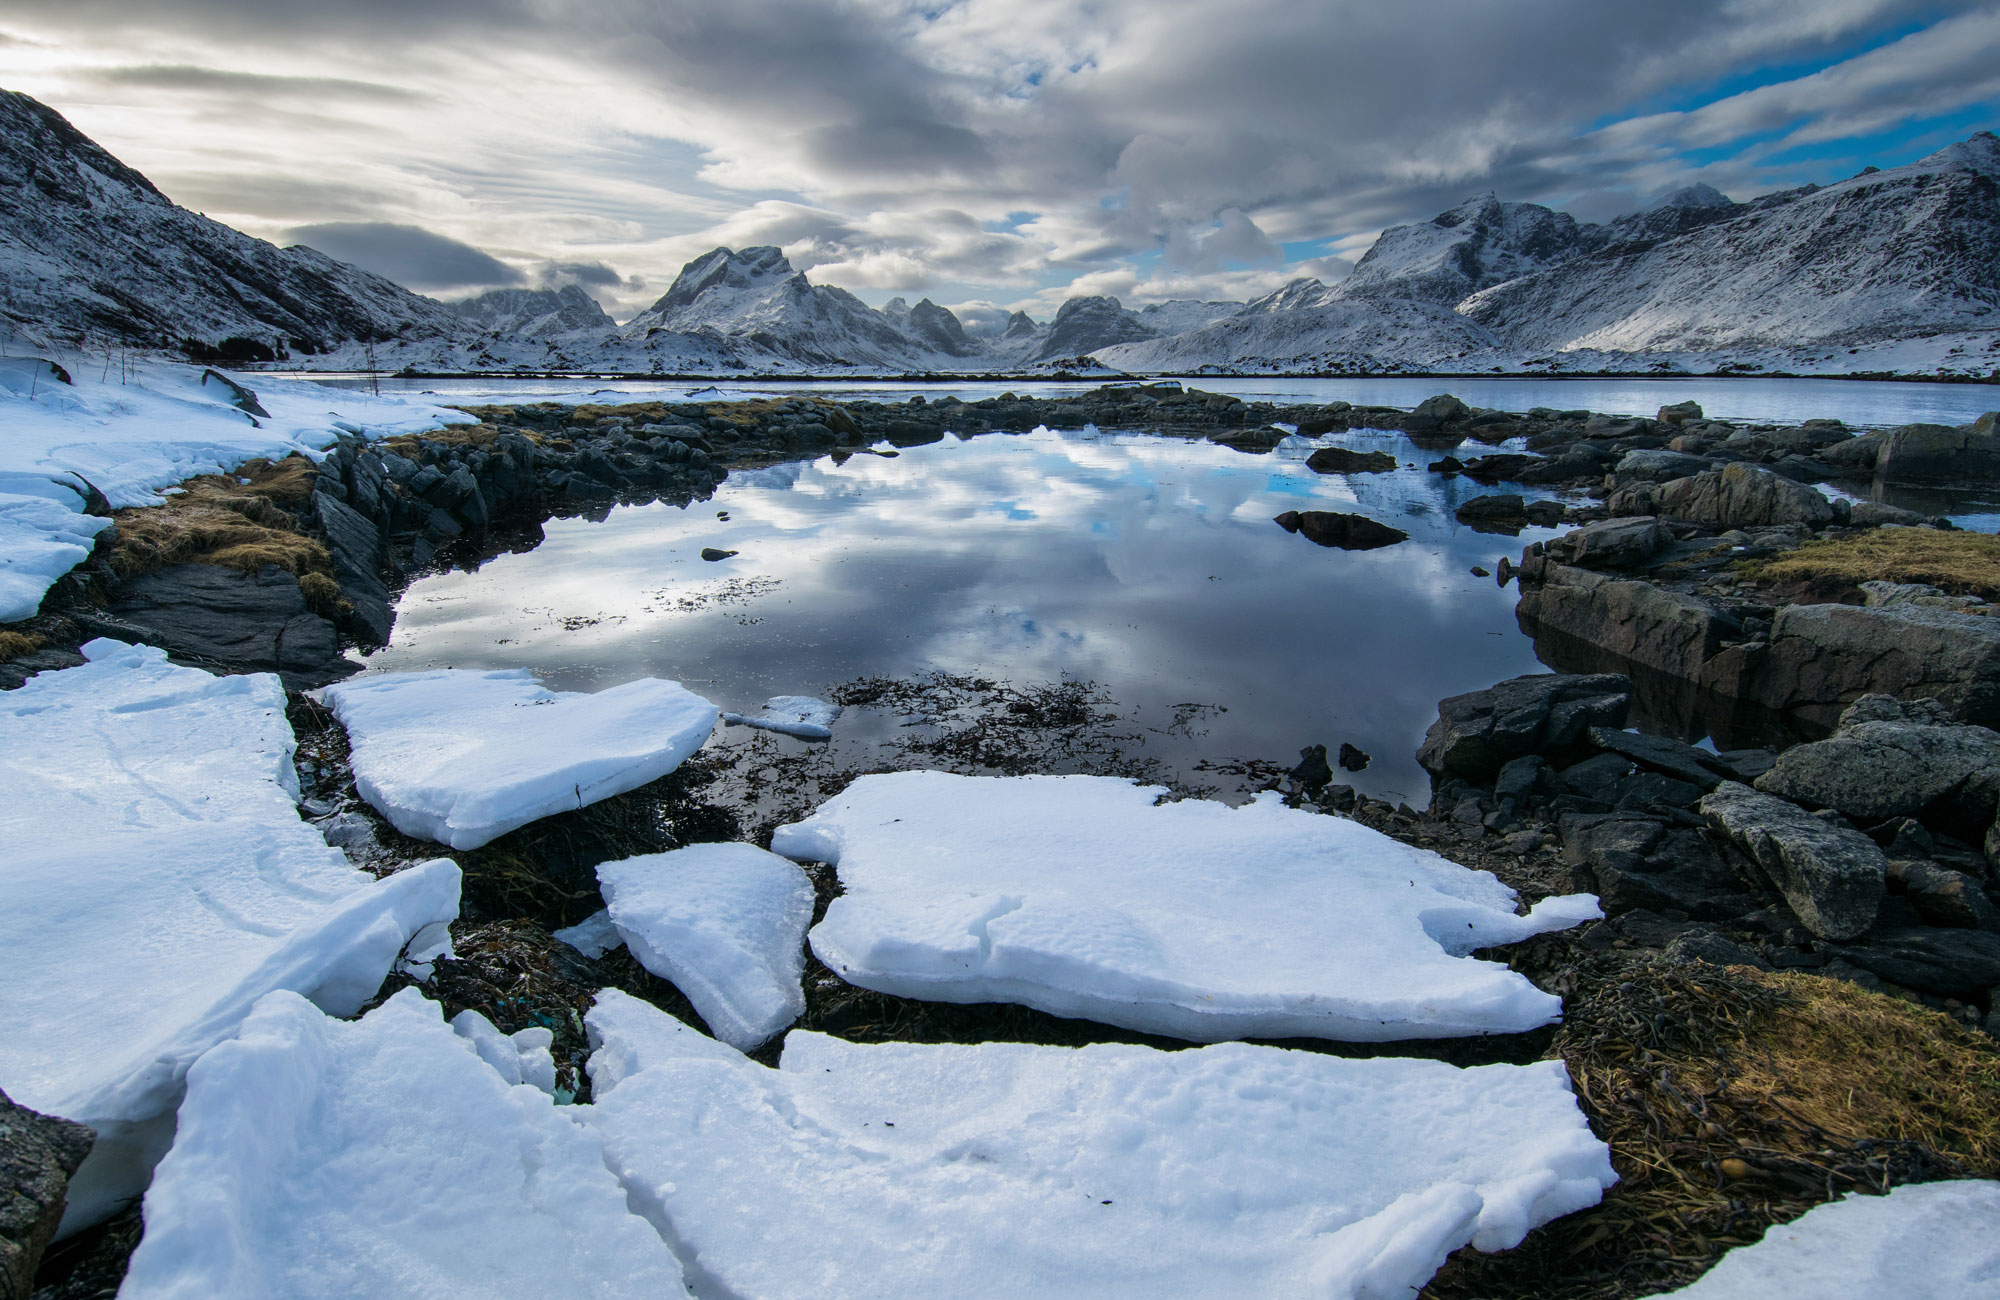 Norvege-fjord-hiver-amplitudes